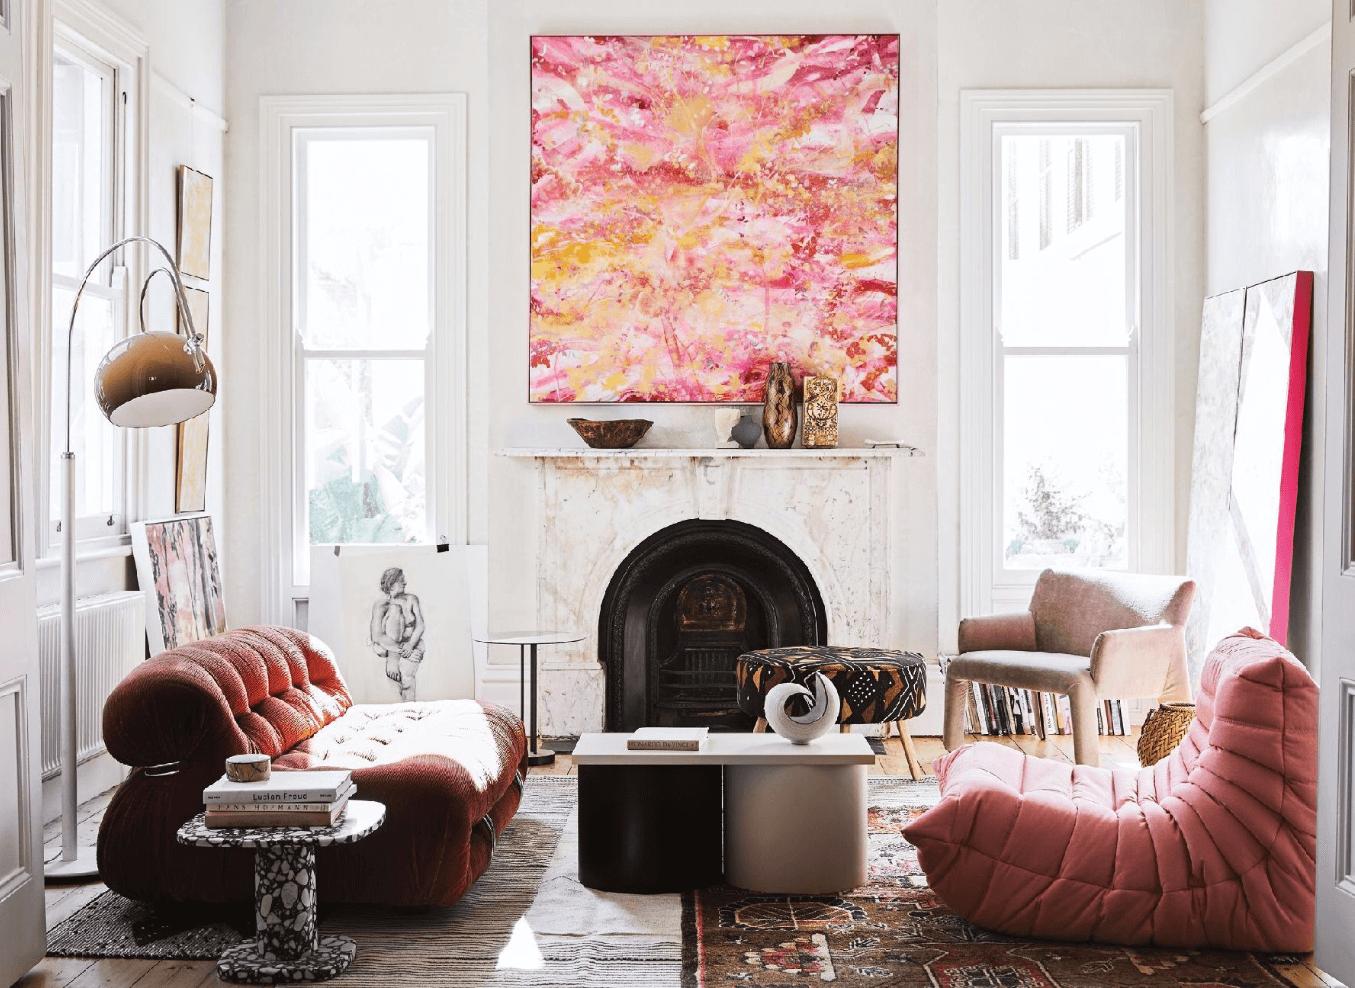 Modern Pink Living Room, Ligne Roset Togo chair, iGuzzini floor lamp, Cassina Soriano Sofa, Molteni Glove-up chair